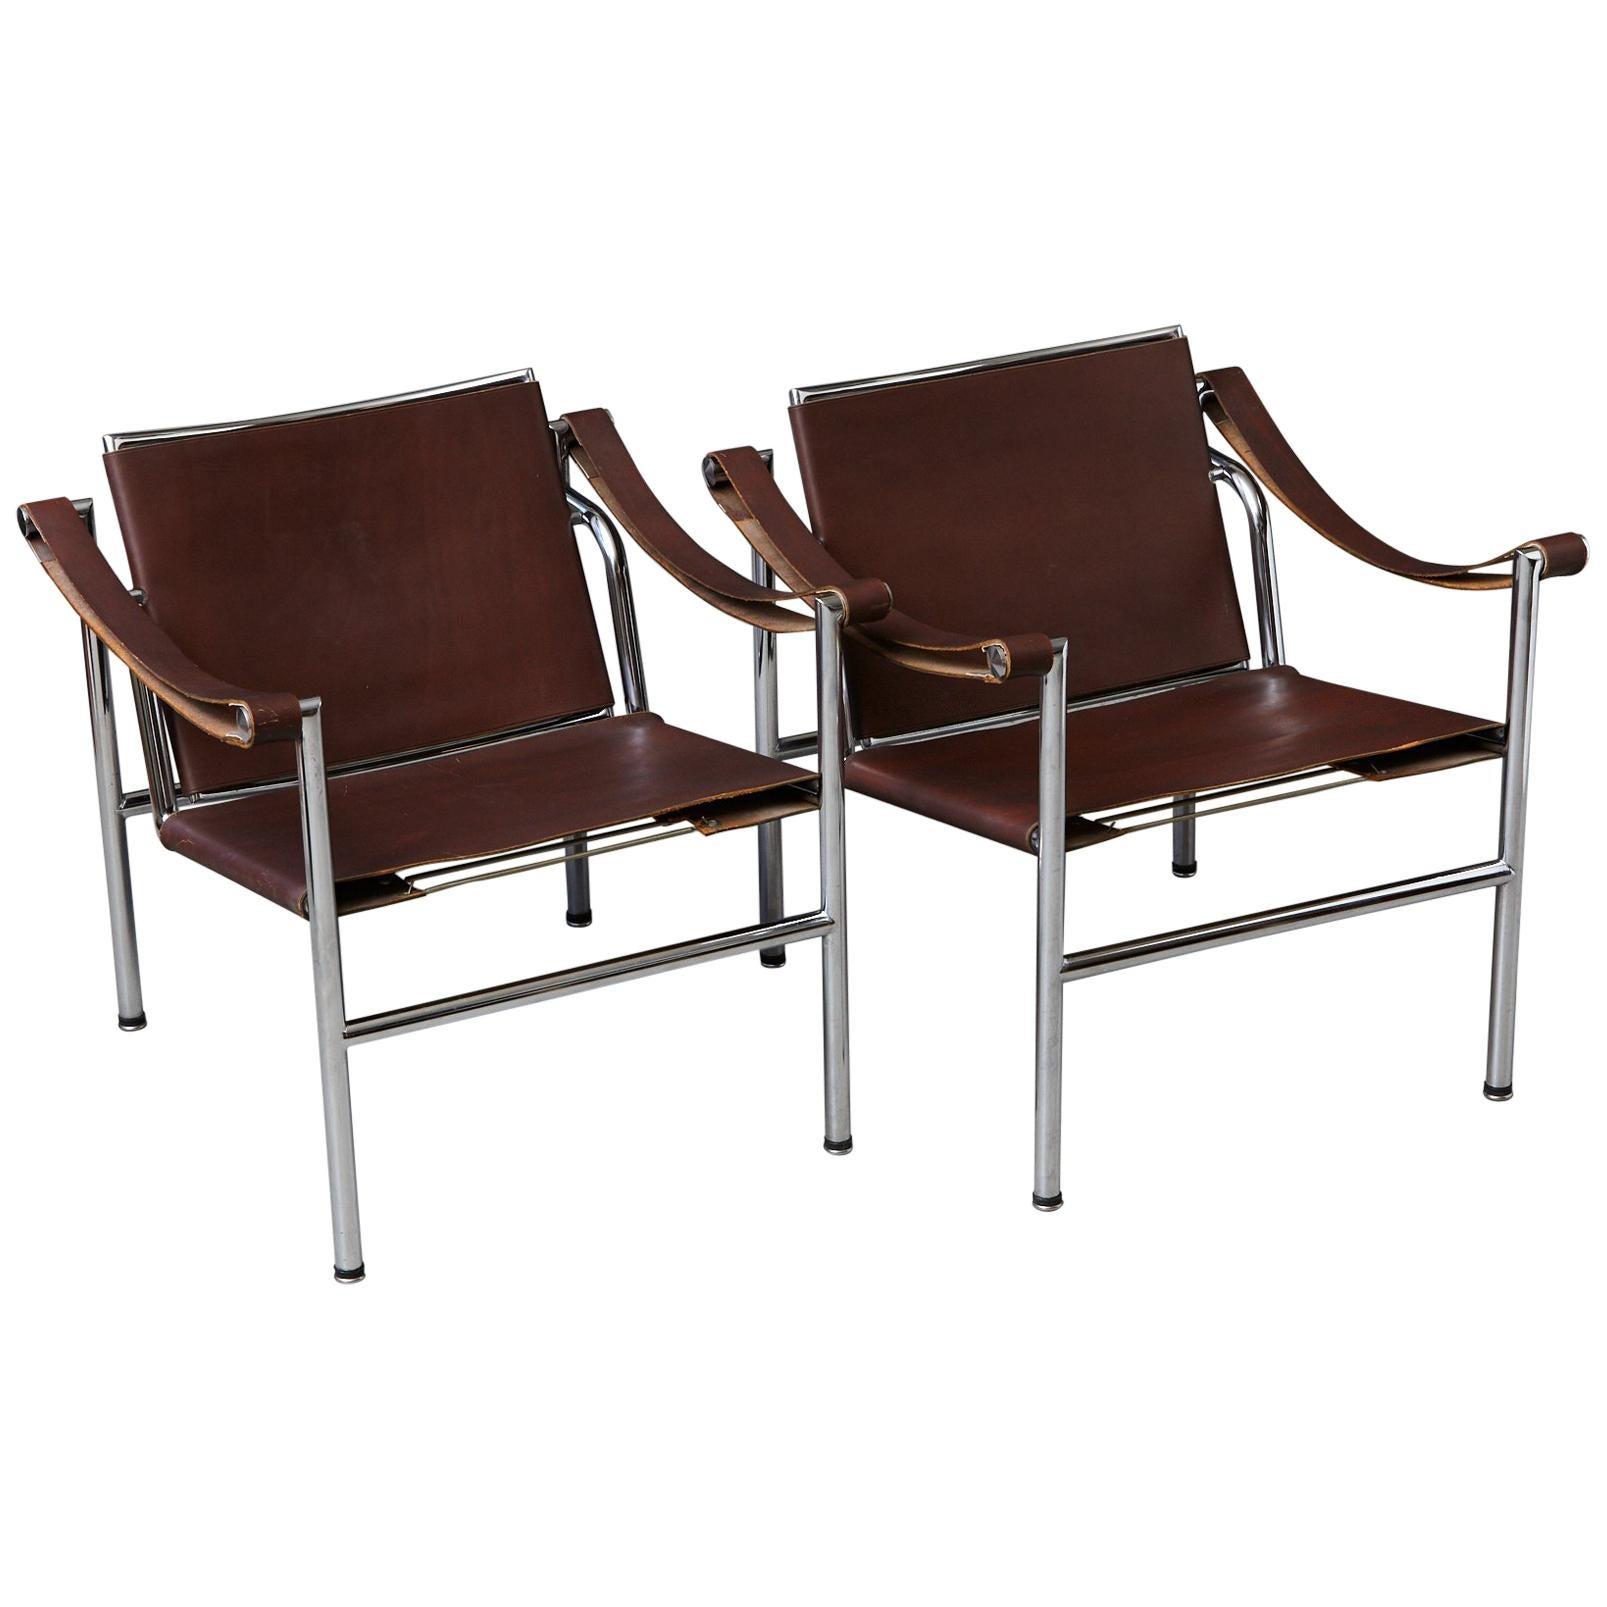 Attirant Rare Pair Of Original Le Corbusier U0027Corbuu0027 Chairs U0027LC1u0027, From Wohnbedarf